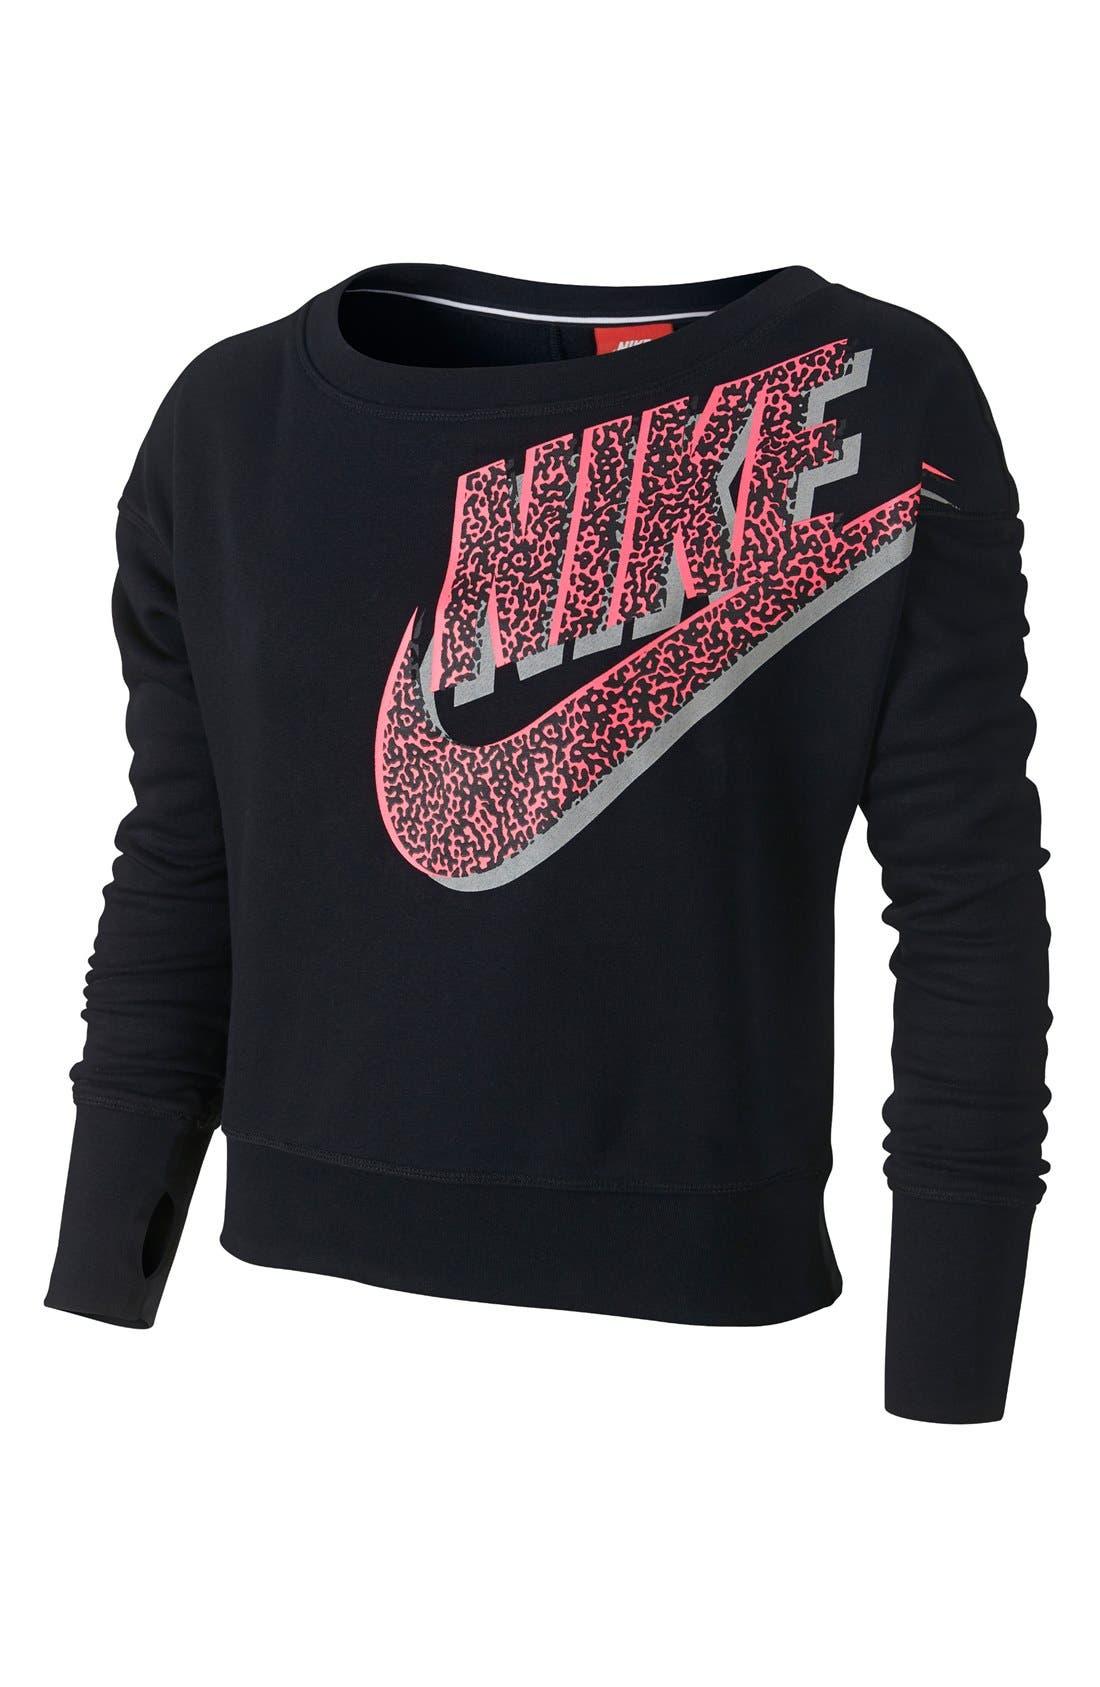 Main Image - Nike Crop Sweatshirt (Big Girls) (Online Only)